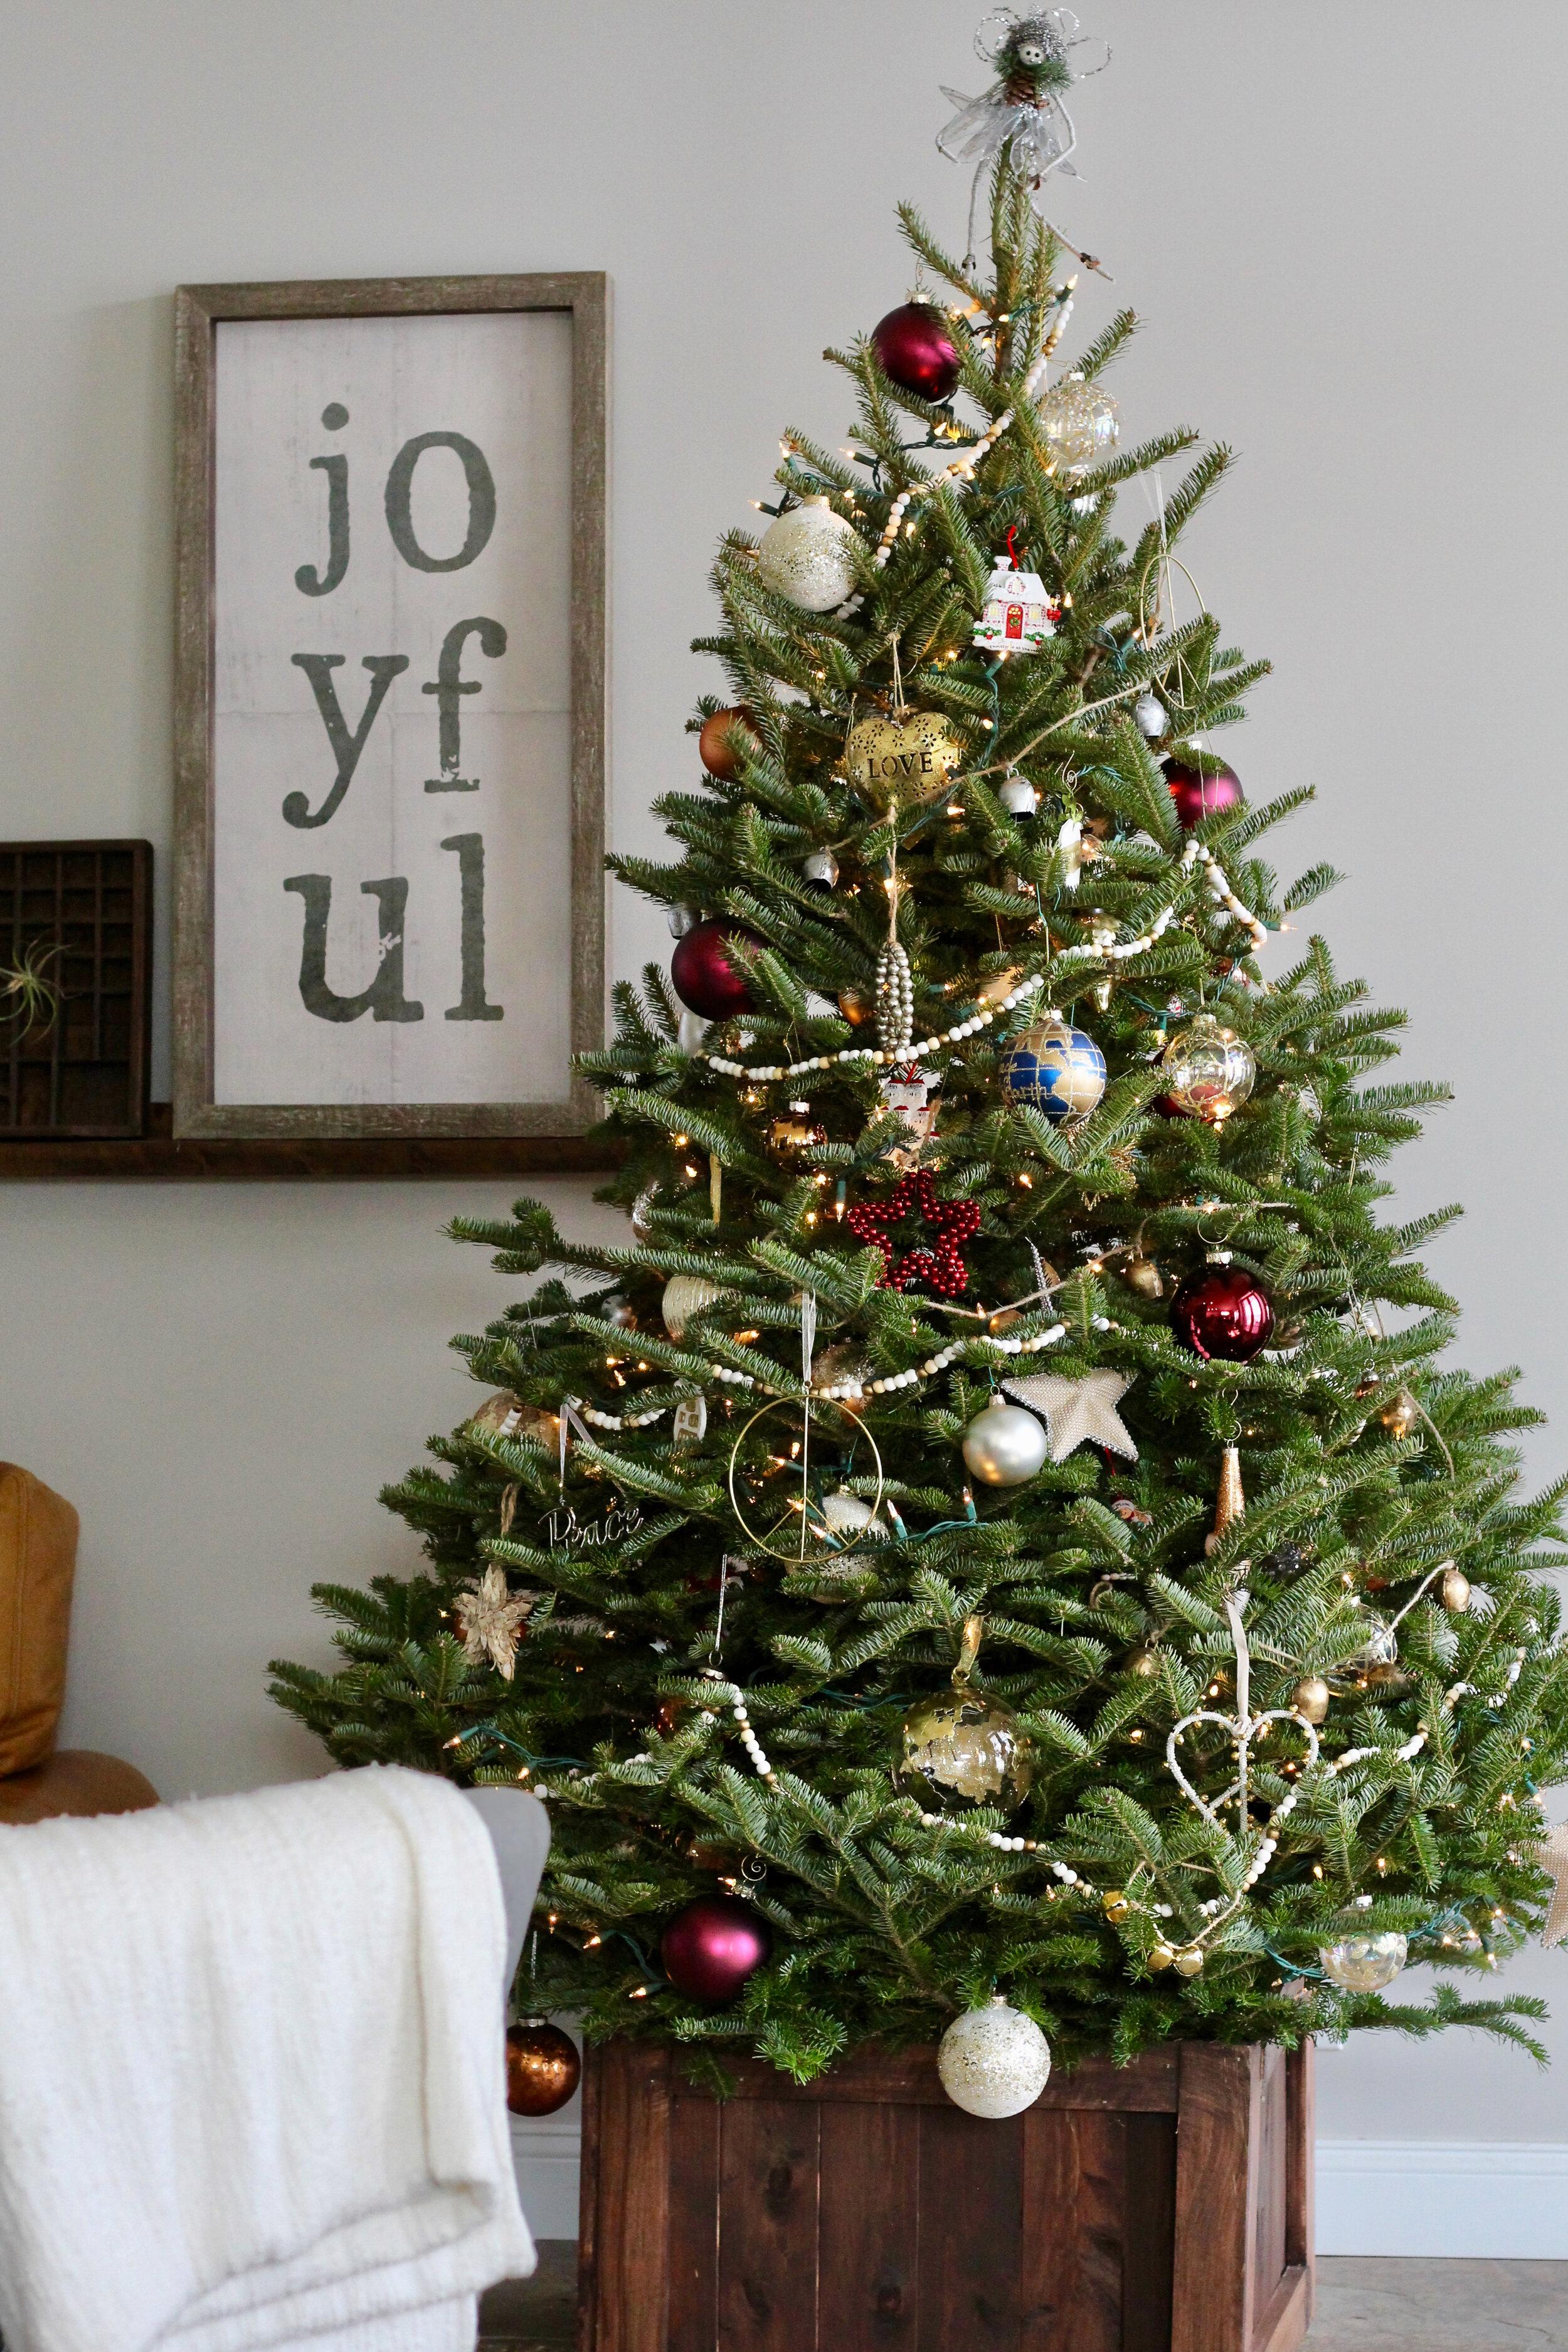 Christmas Tree in a handmade box